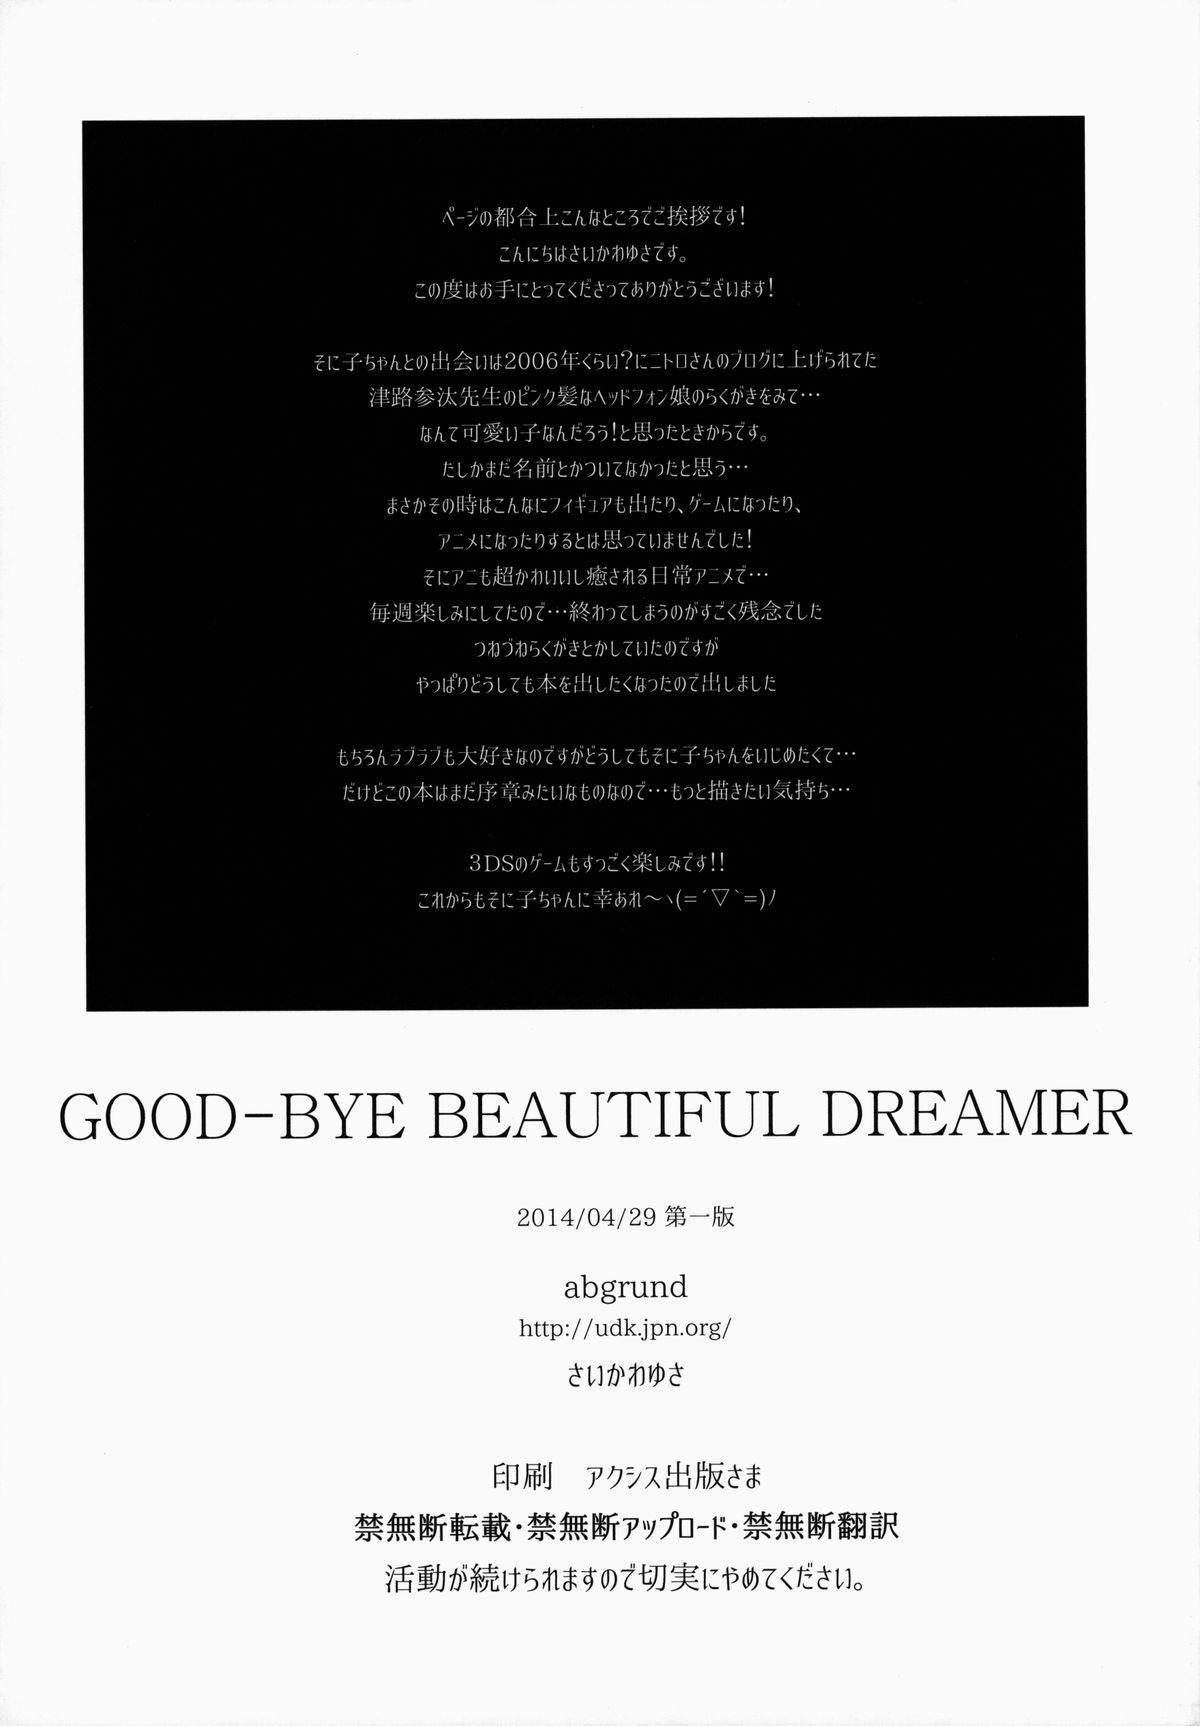 GOOD-BYE BEAUTIFUL DREAMER 2